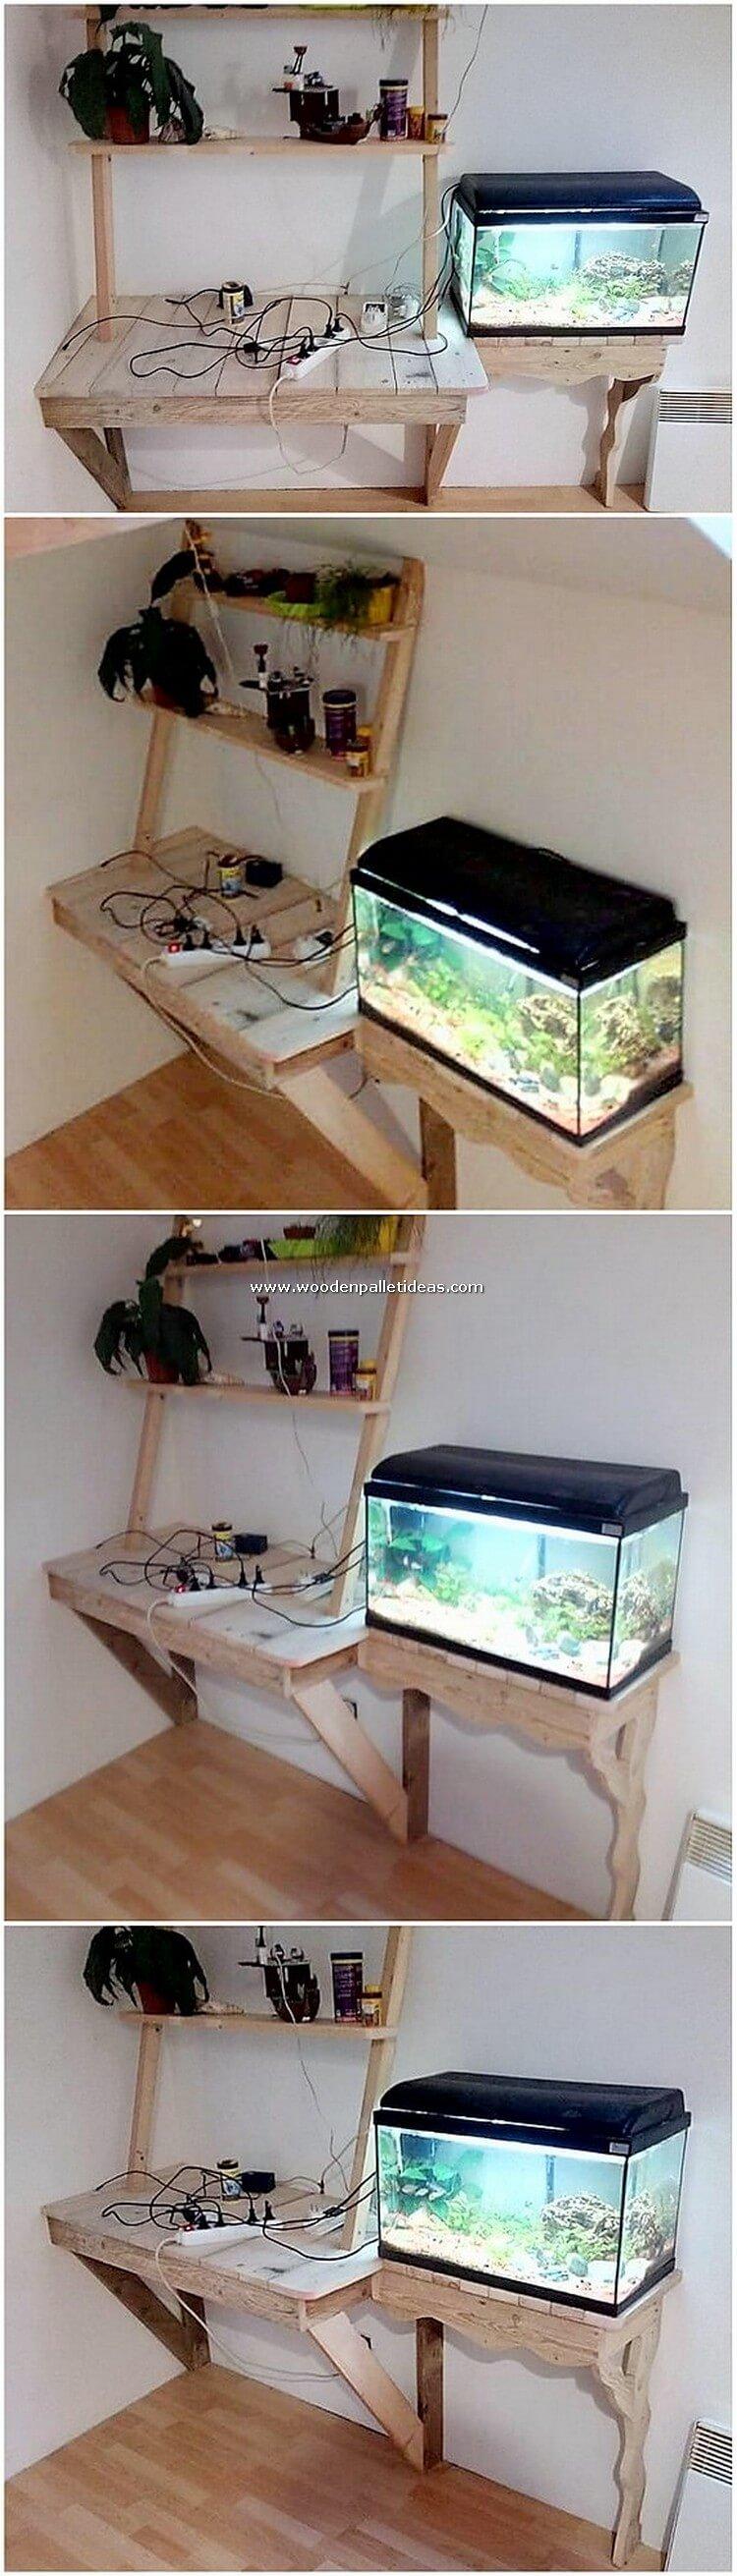 Pallet-Aquarium-Stand-with-Desk-Table